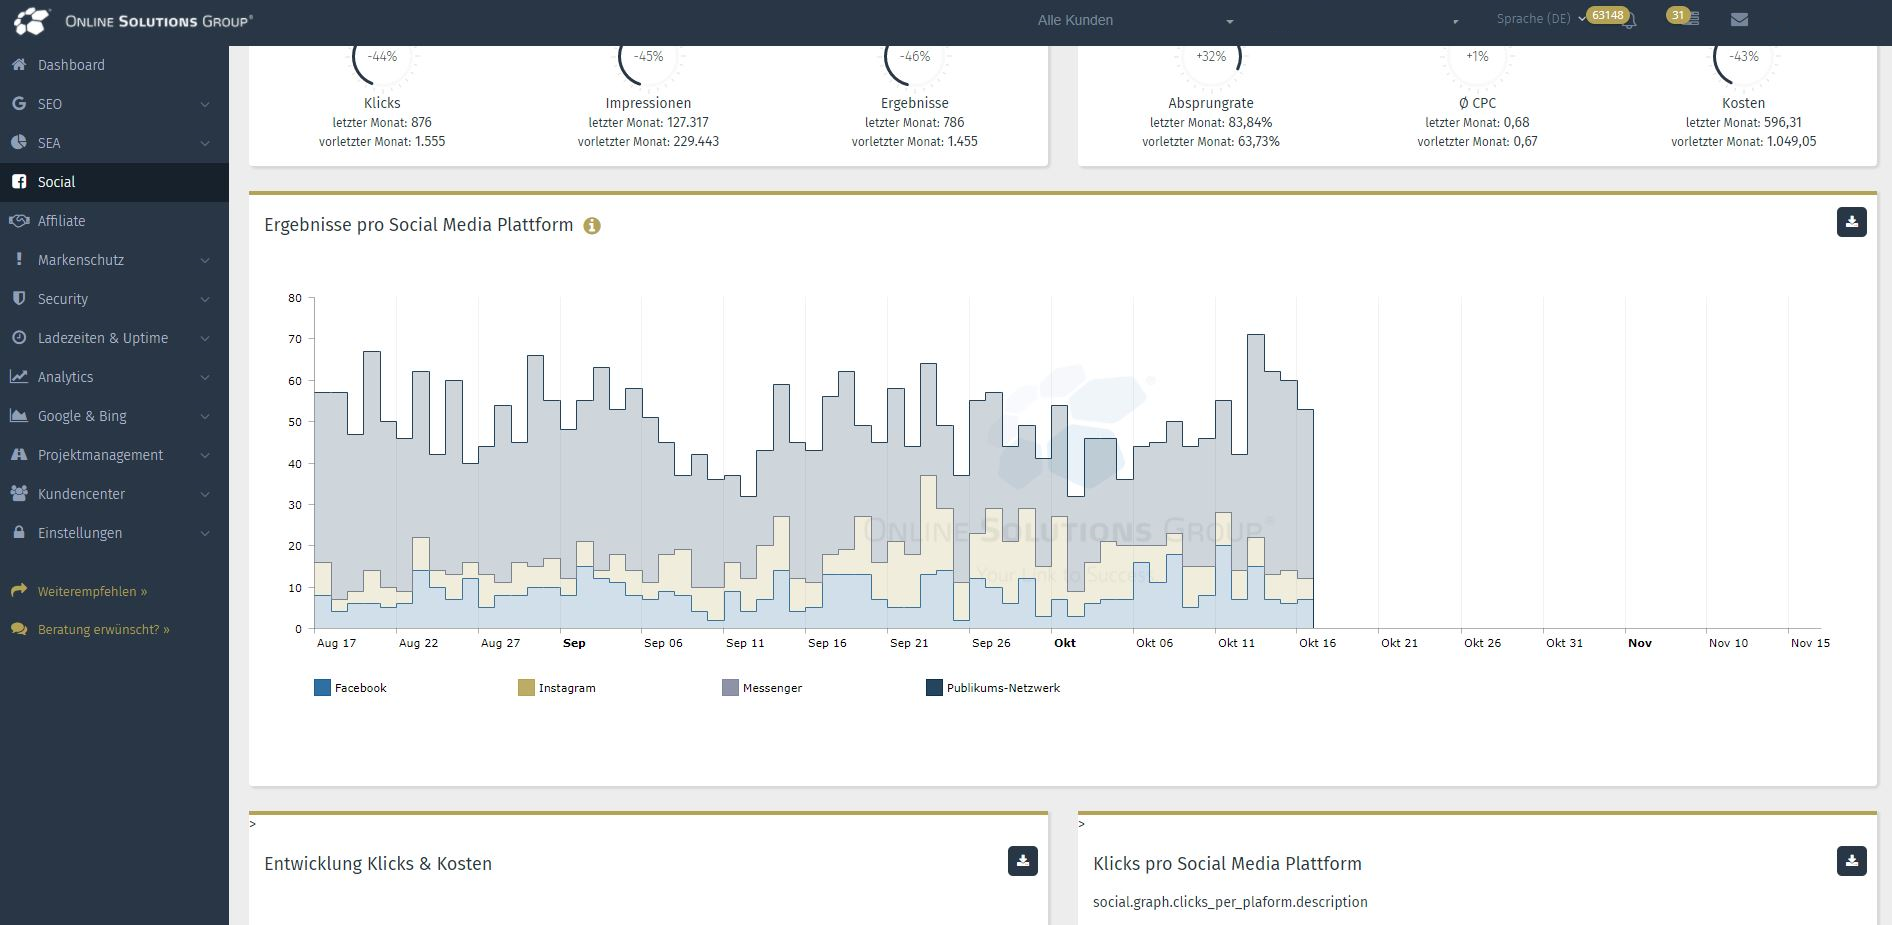 Social Media Tool in der Performance Suite: Ergebnisse pro Plattform